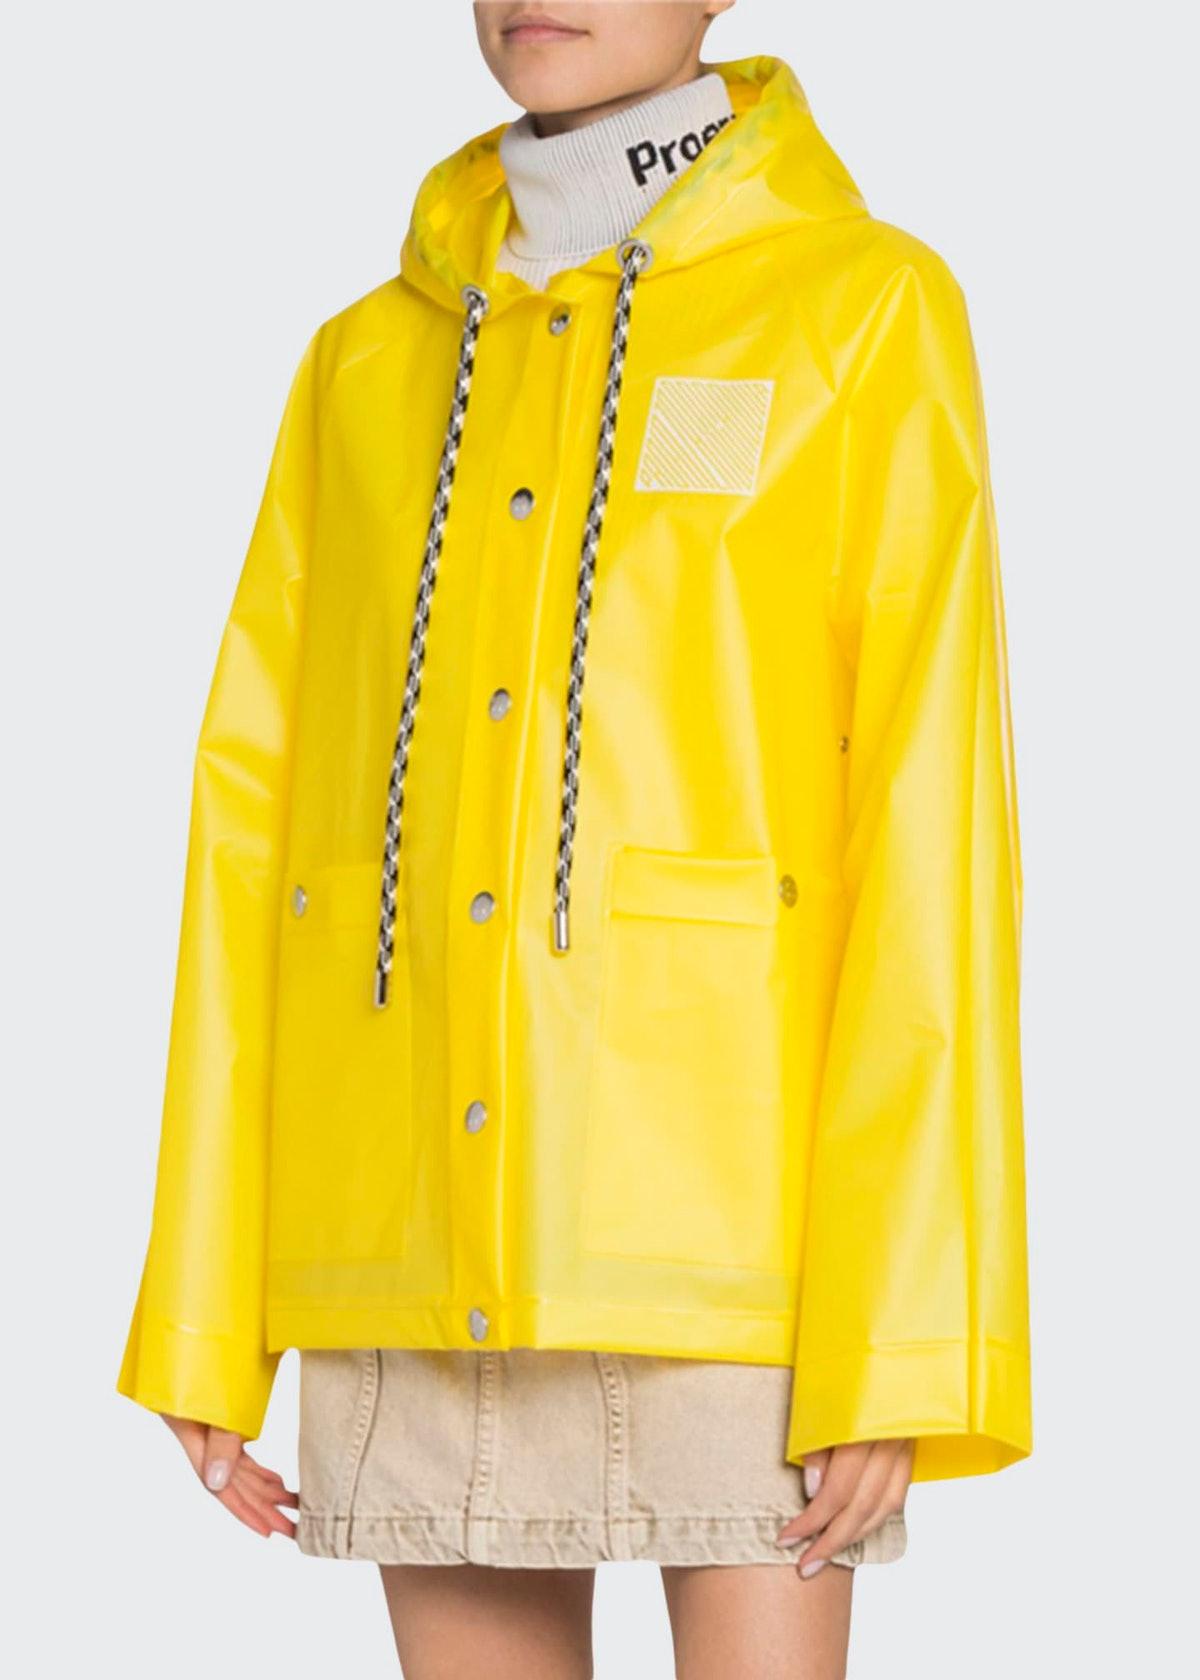 Proenza Schouler Utility Jacket